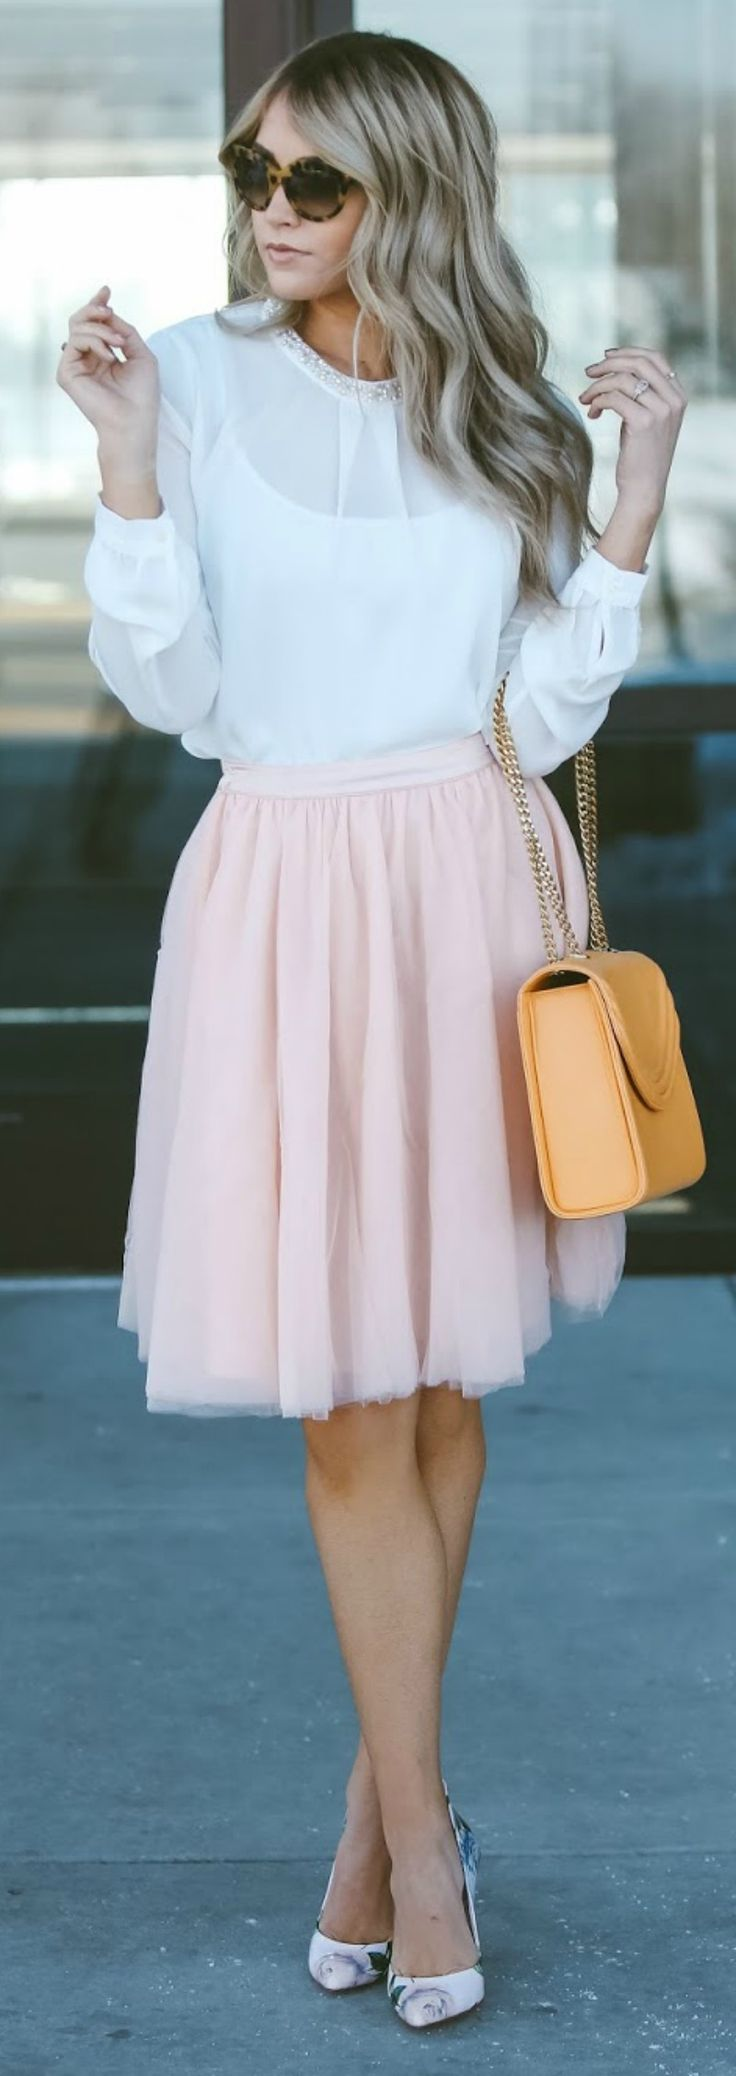 25+ best ideas about Pink Tulle Skirt on Pinterest ...